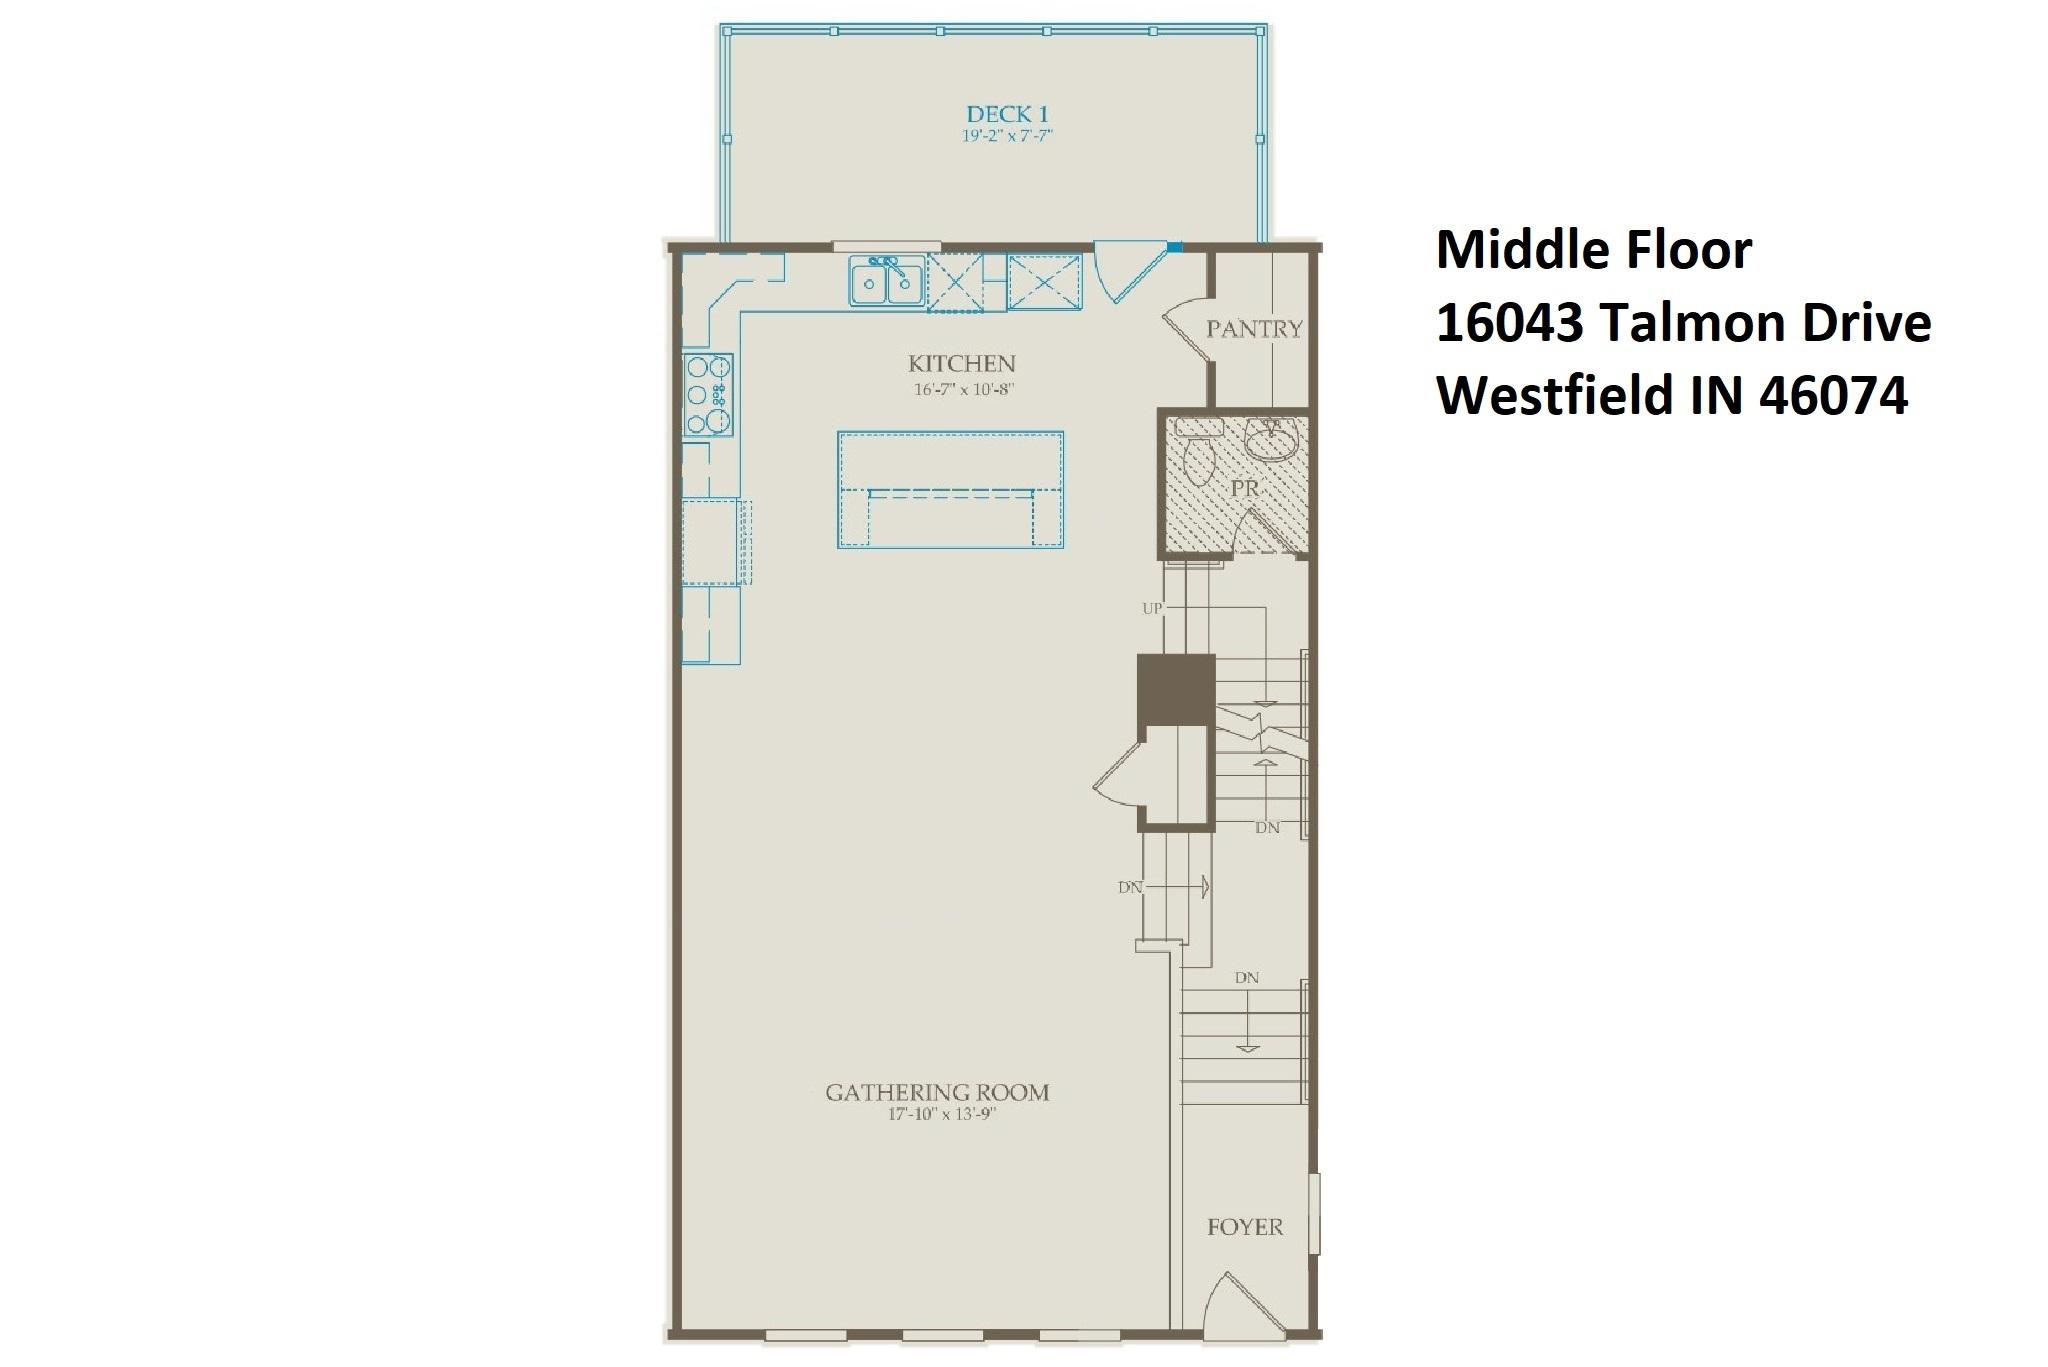 16043 Talmon Drive Westfield IN 46074 - KW-ToHelpUmove - BLC 21800916 - Mitch Rolsky (3)